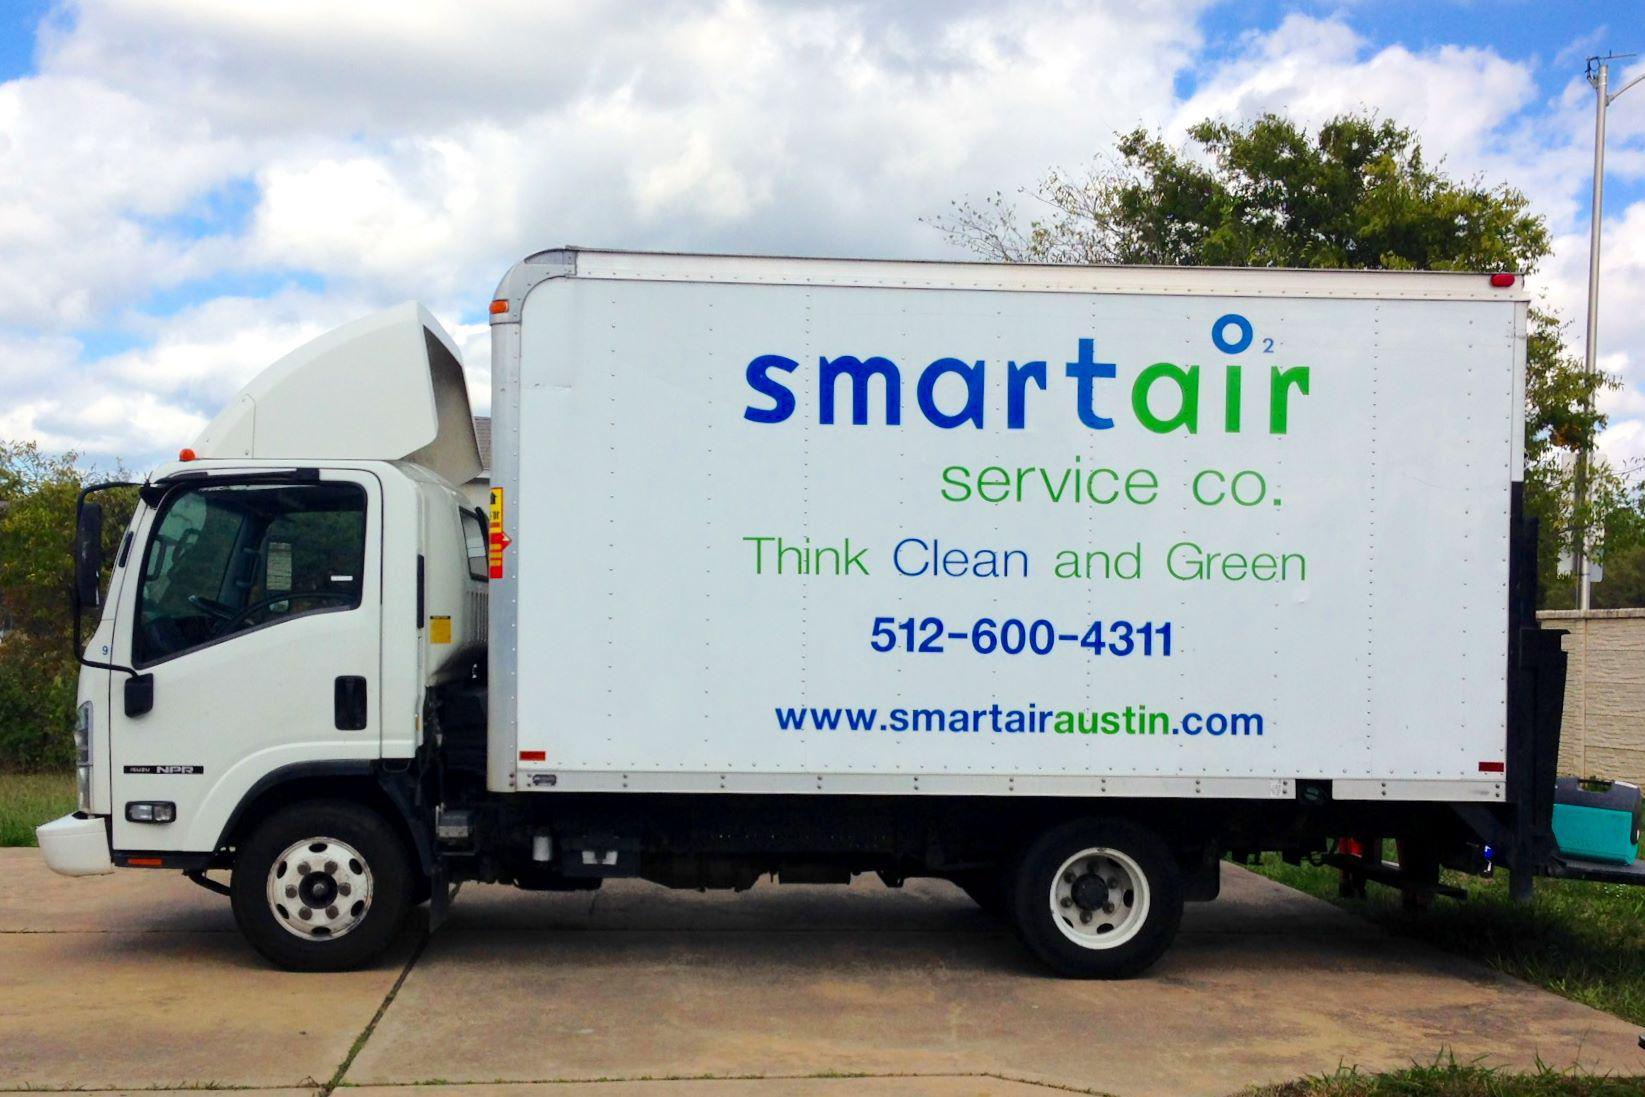 Smart Air Service Co.